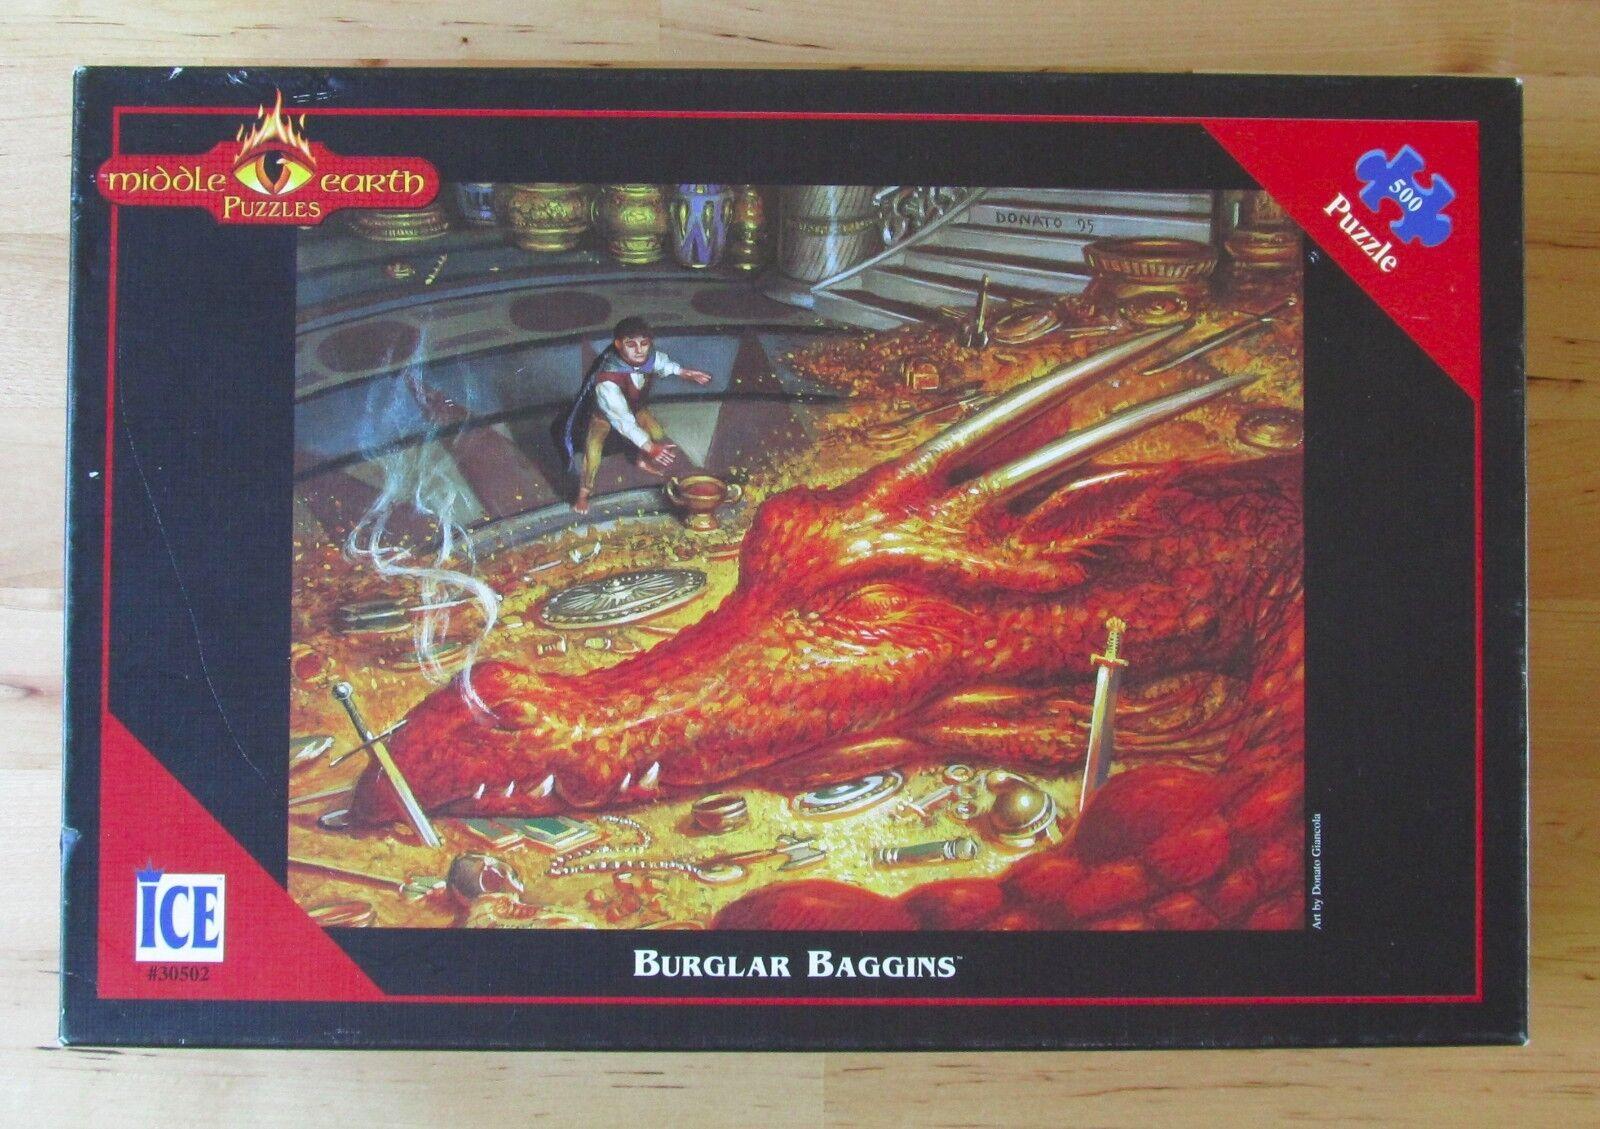 1997 Middle Earth Puzzle Cambrioleur Bilbo Bilbo 500 pieces Donato Giancola  30502